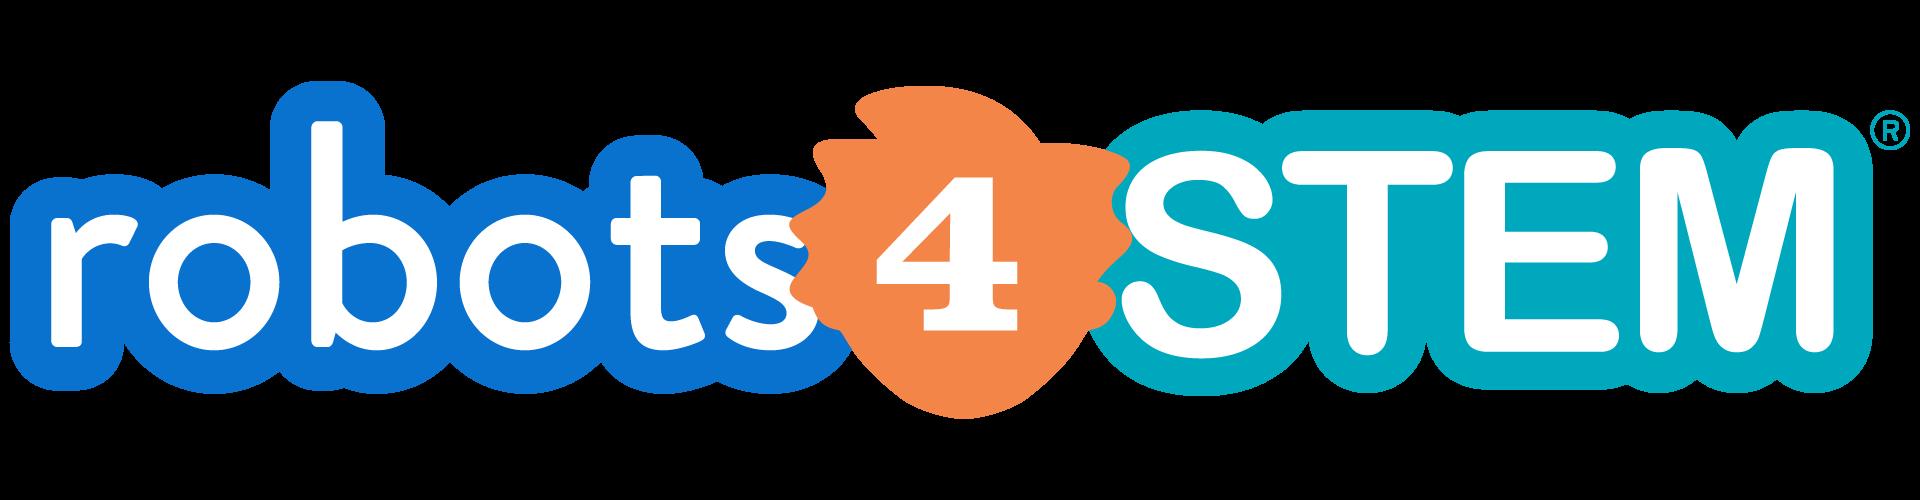 R4S-trans